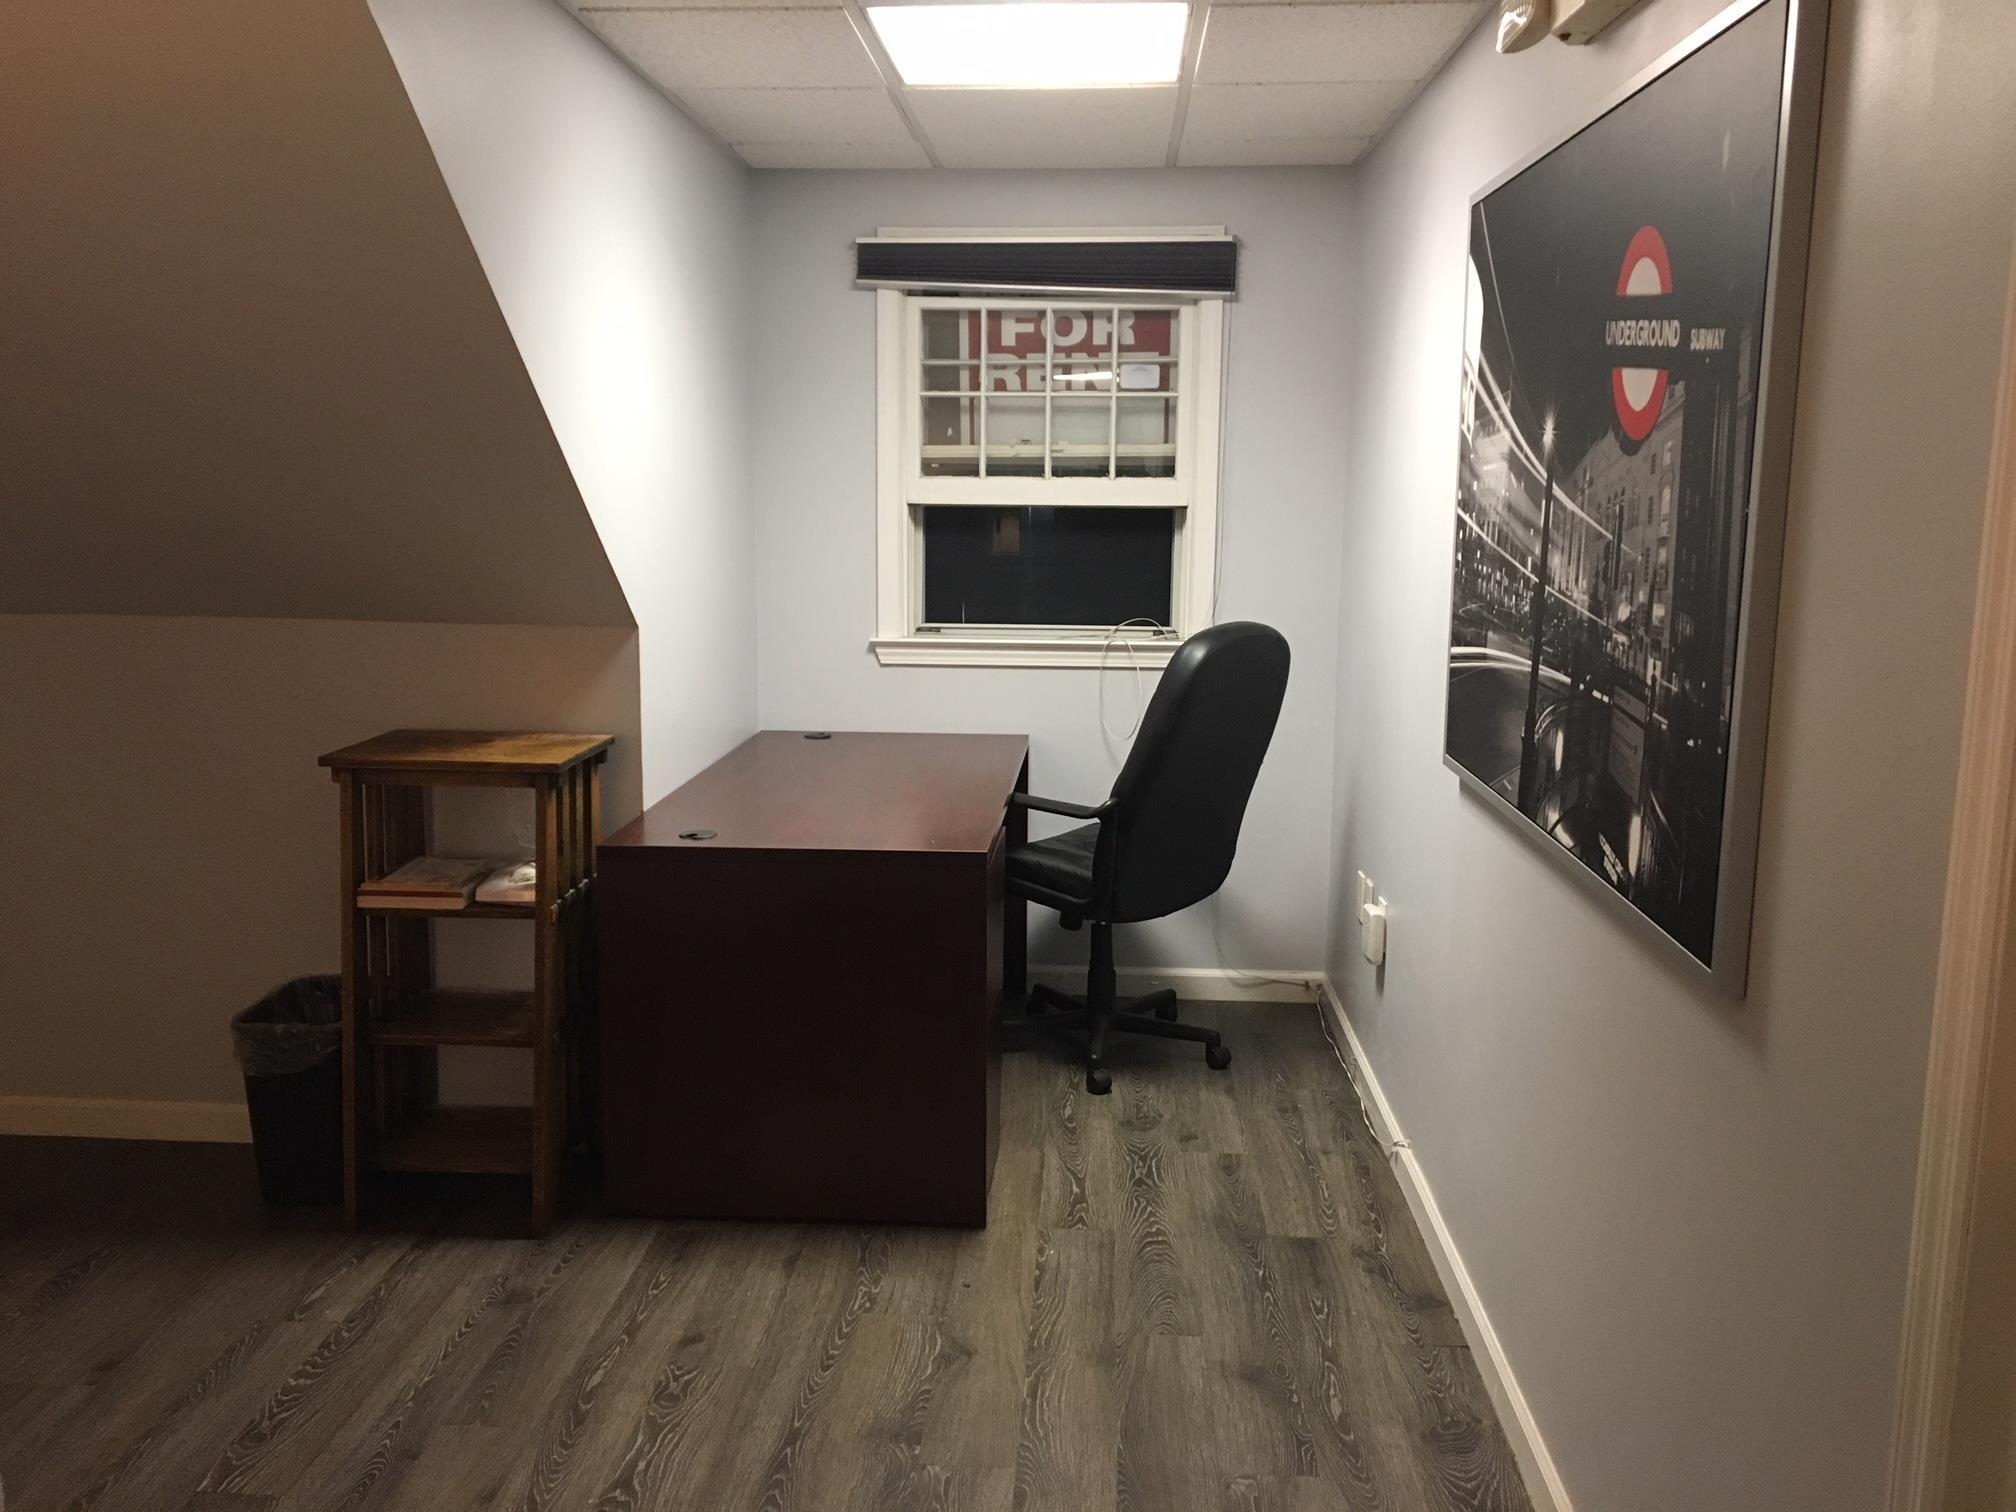 755 Main Street - Building 8 - Office 1